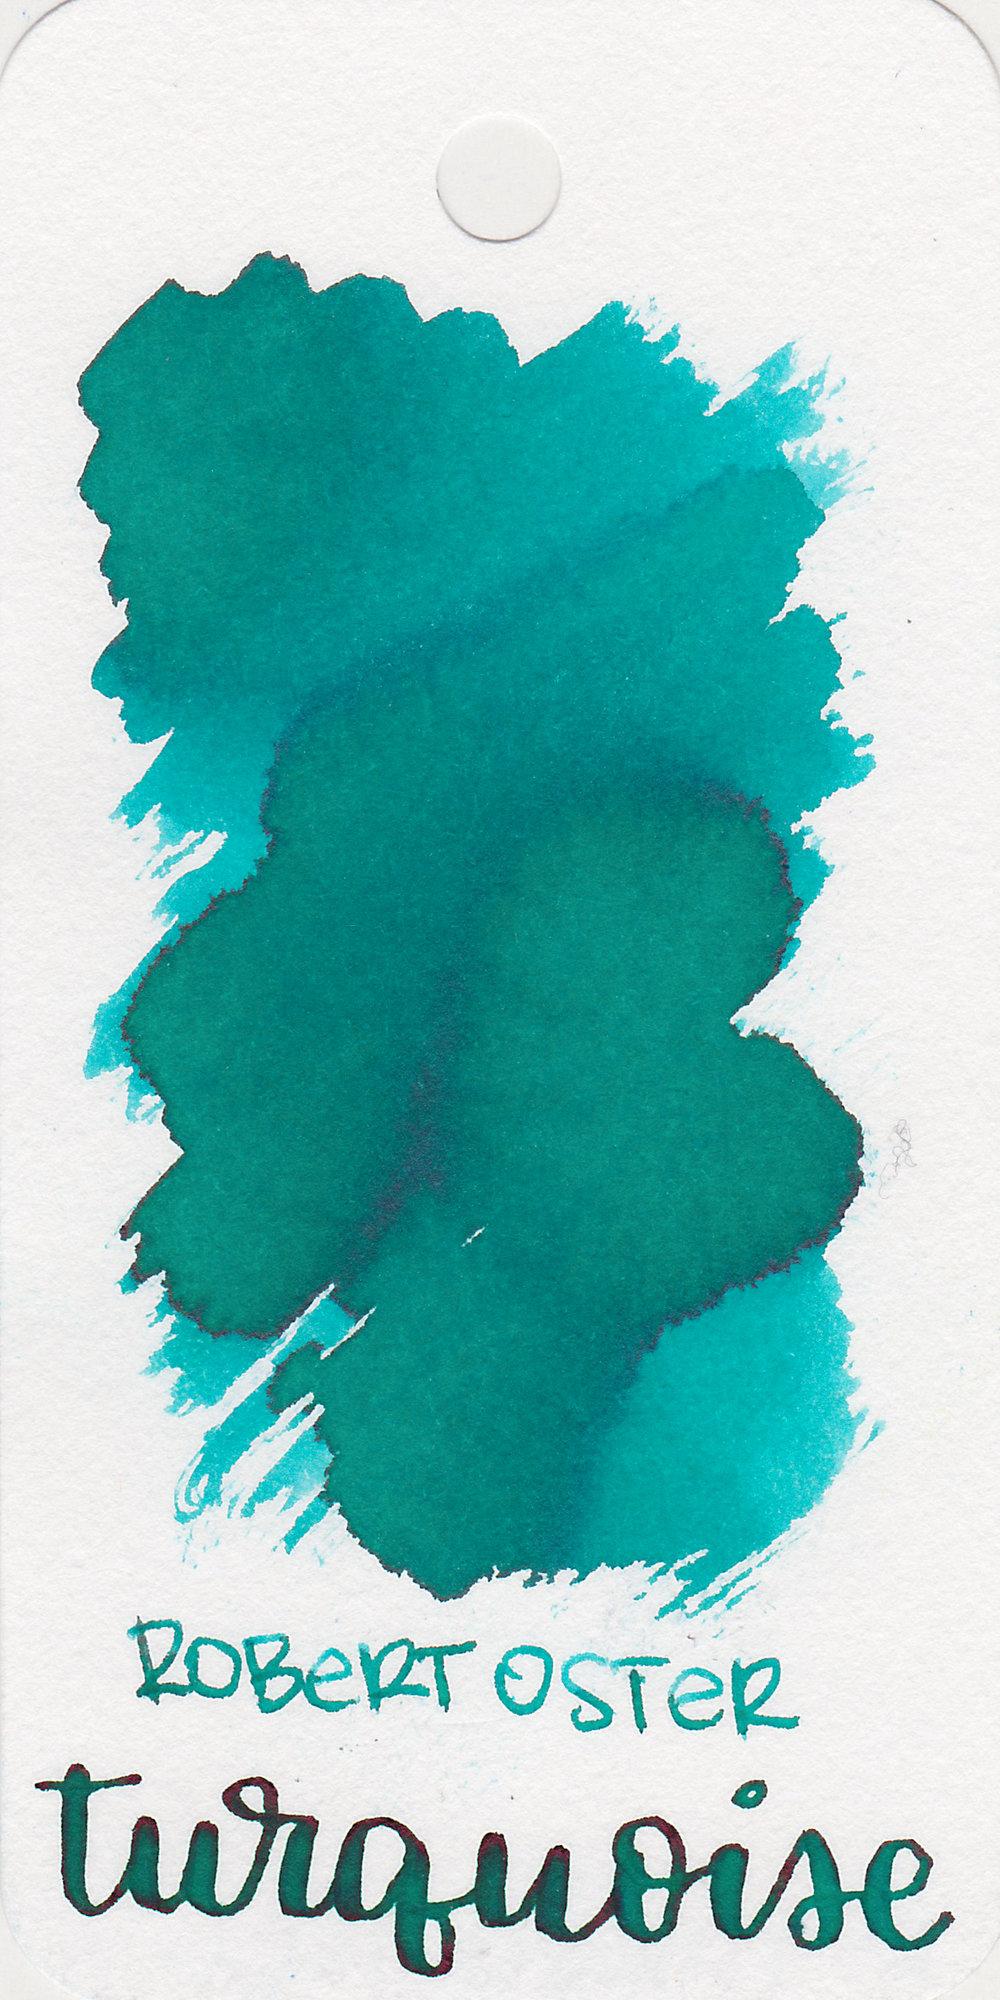 ro-turquoise-1.jpg